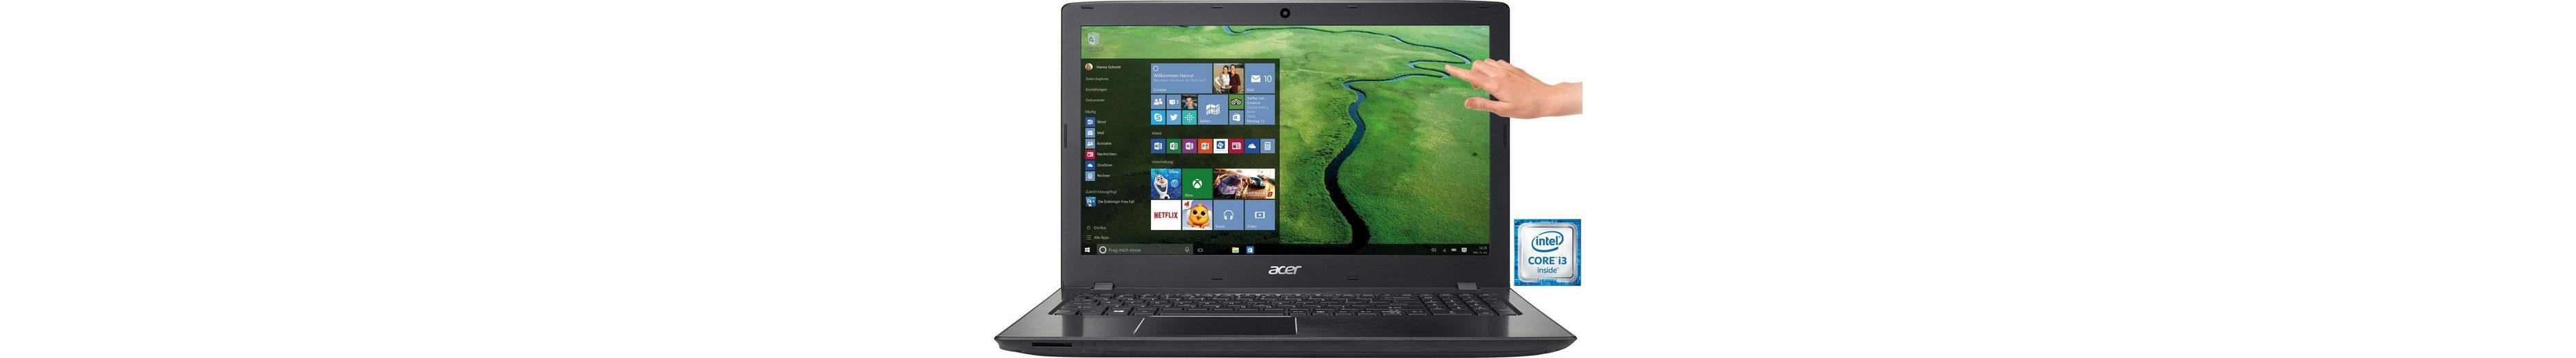 Acer E5-575T-35A3 Notebook, Intel® Core™ i3, 39,6 cm (15,6 Zoll), 1000 GB Speicher, 8192 MB DDR4-RAM